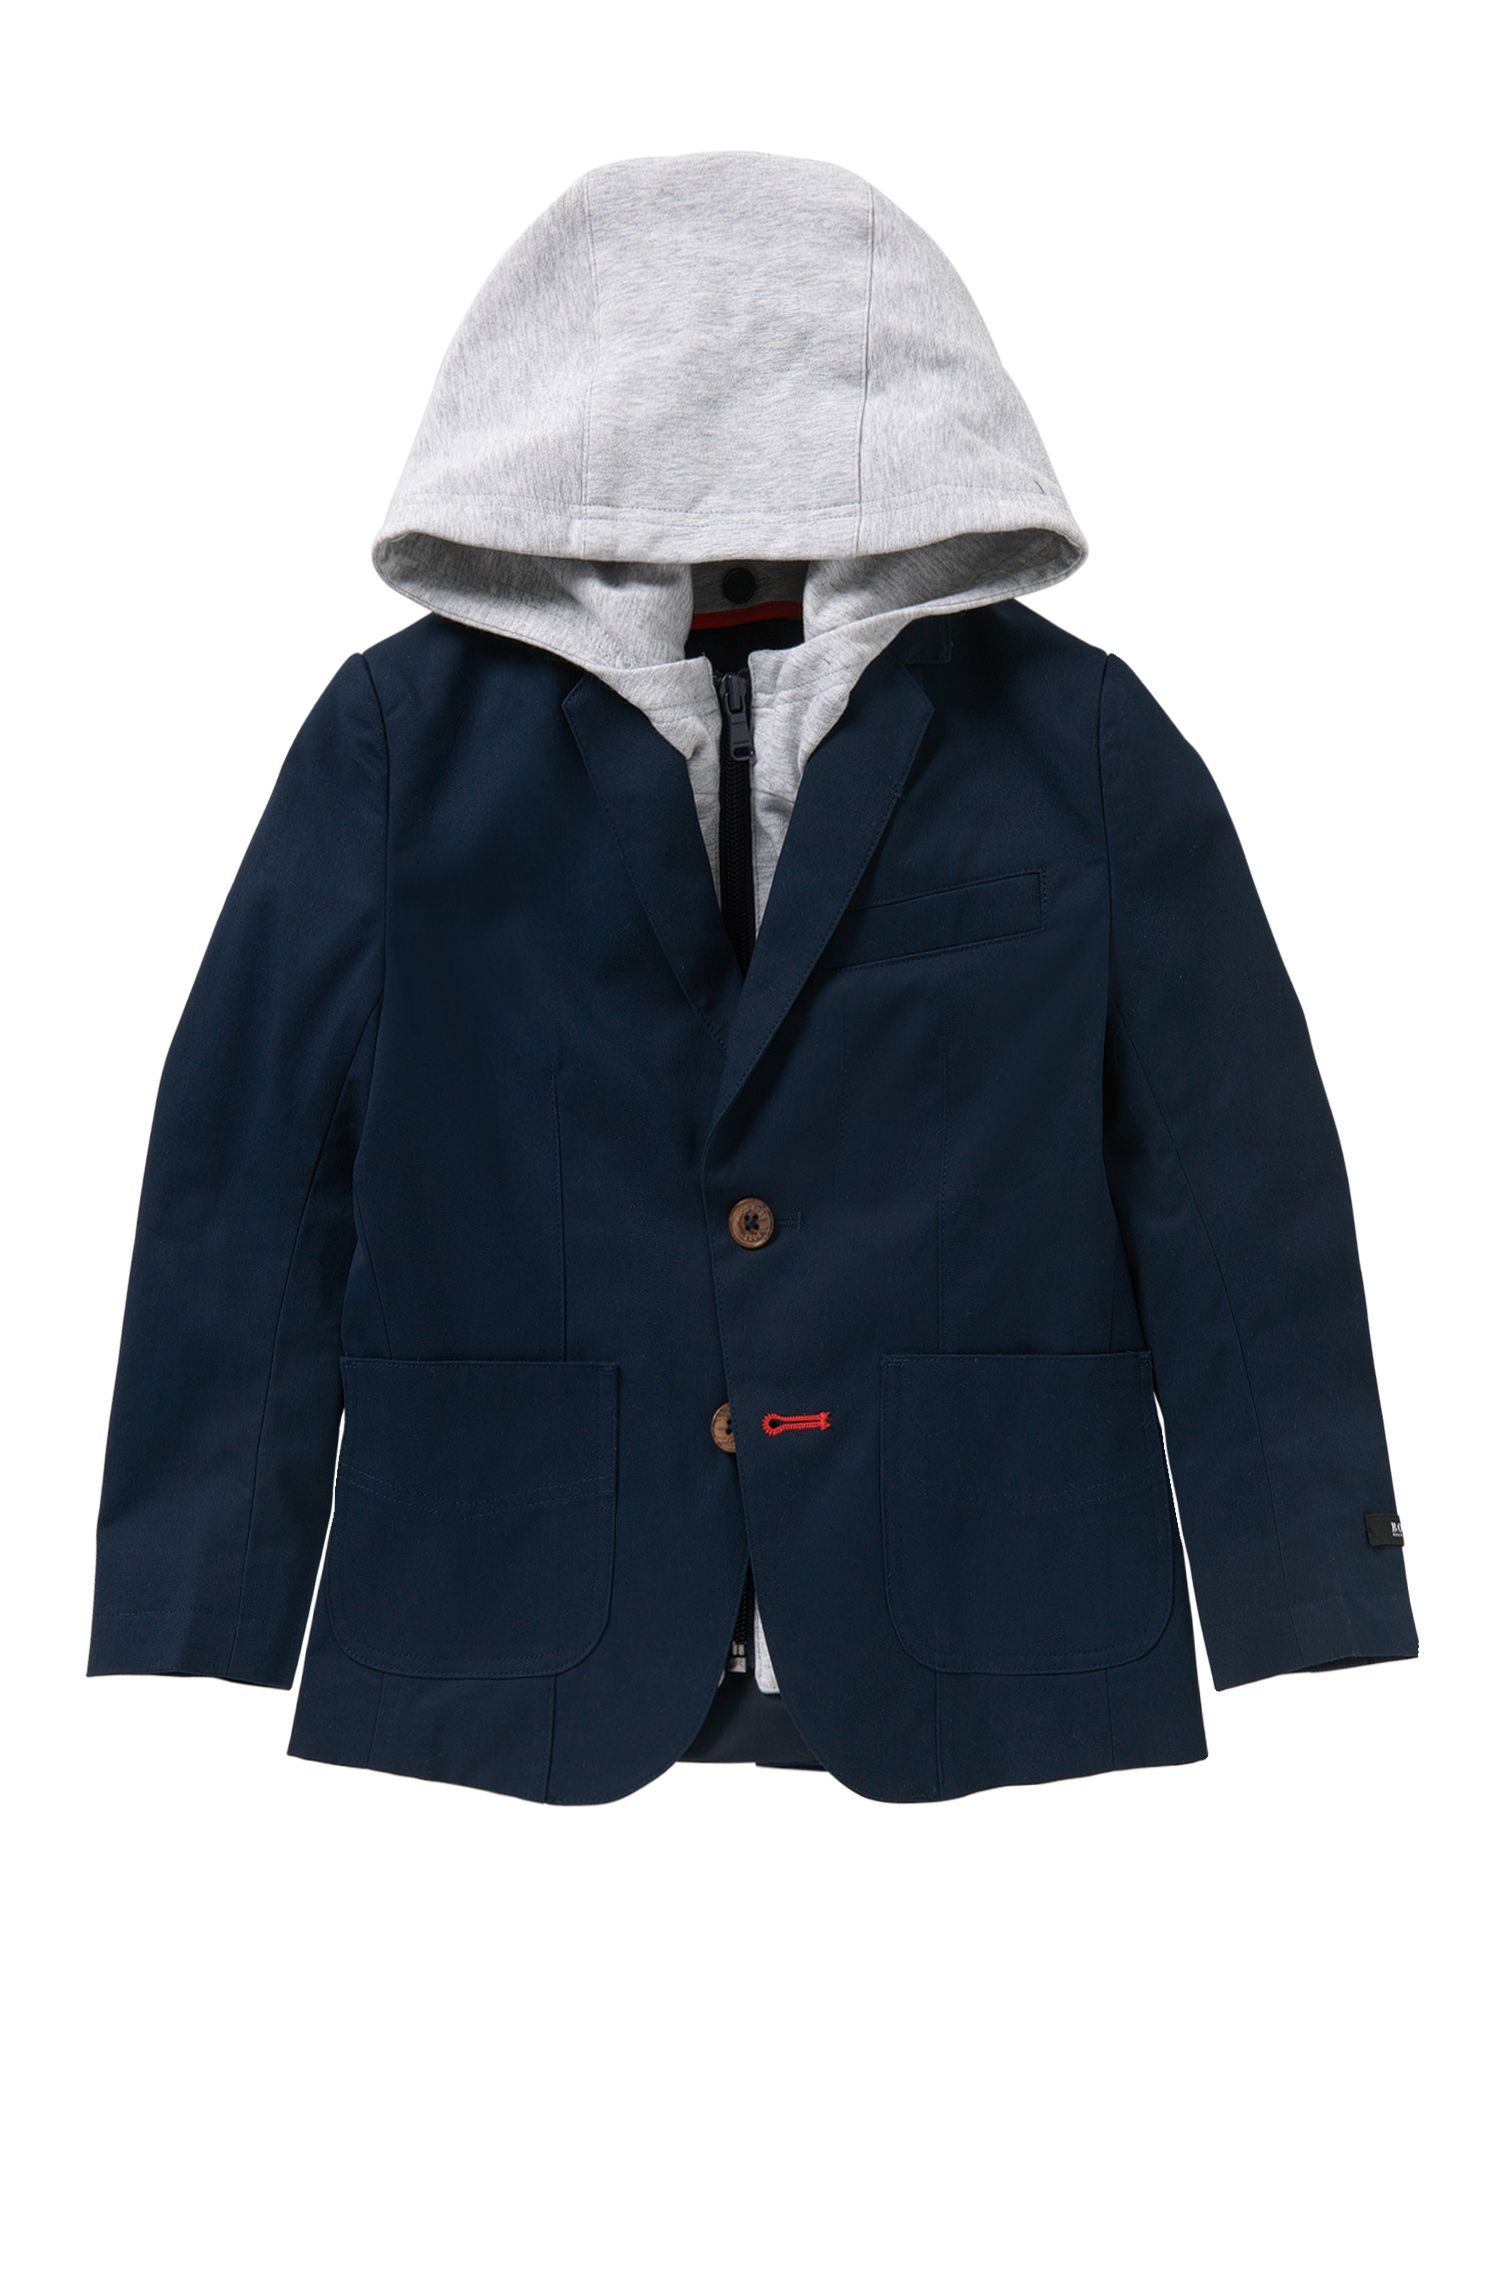 'J26276' | Boys Suit Jacket, Removable Hood